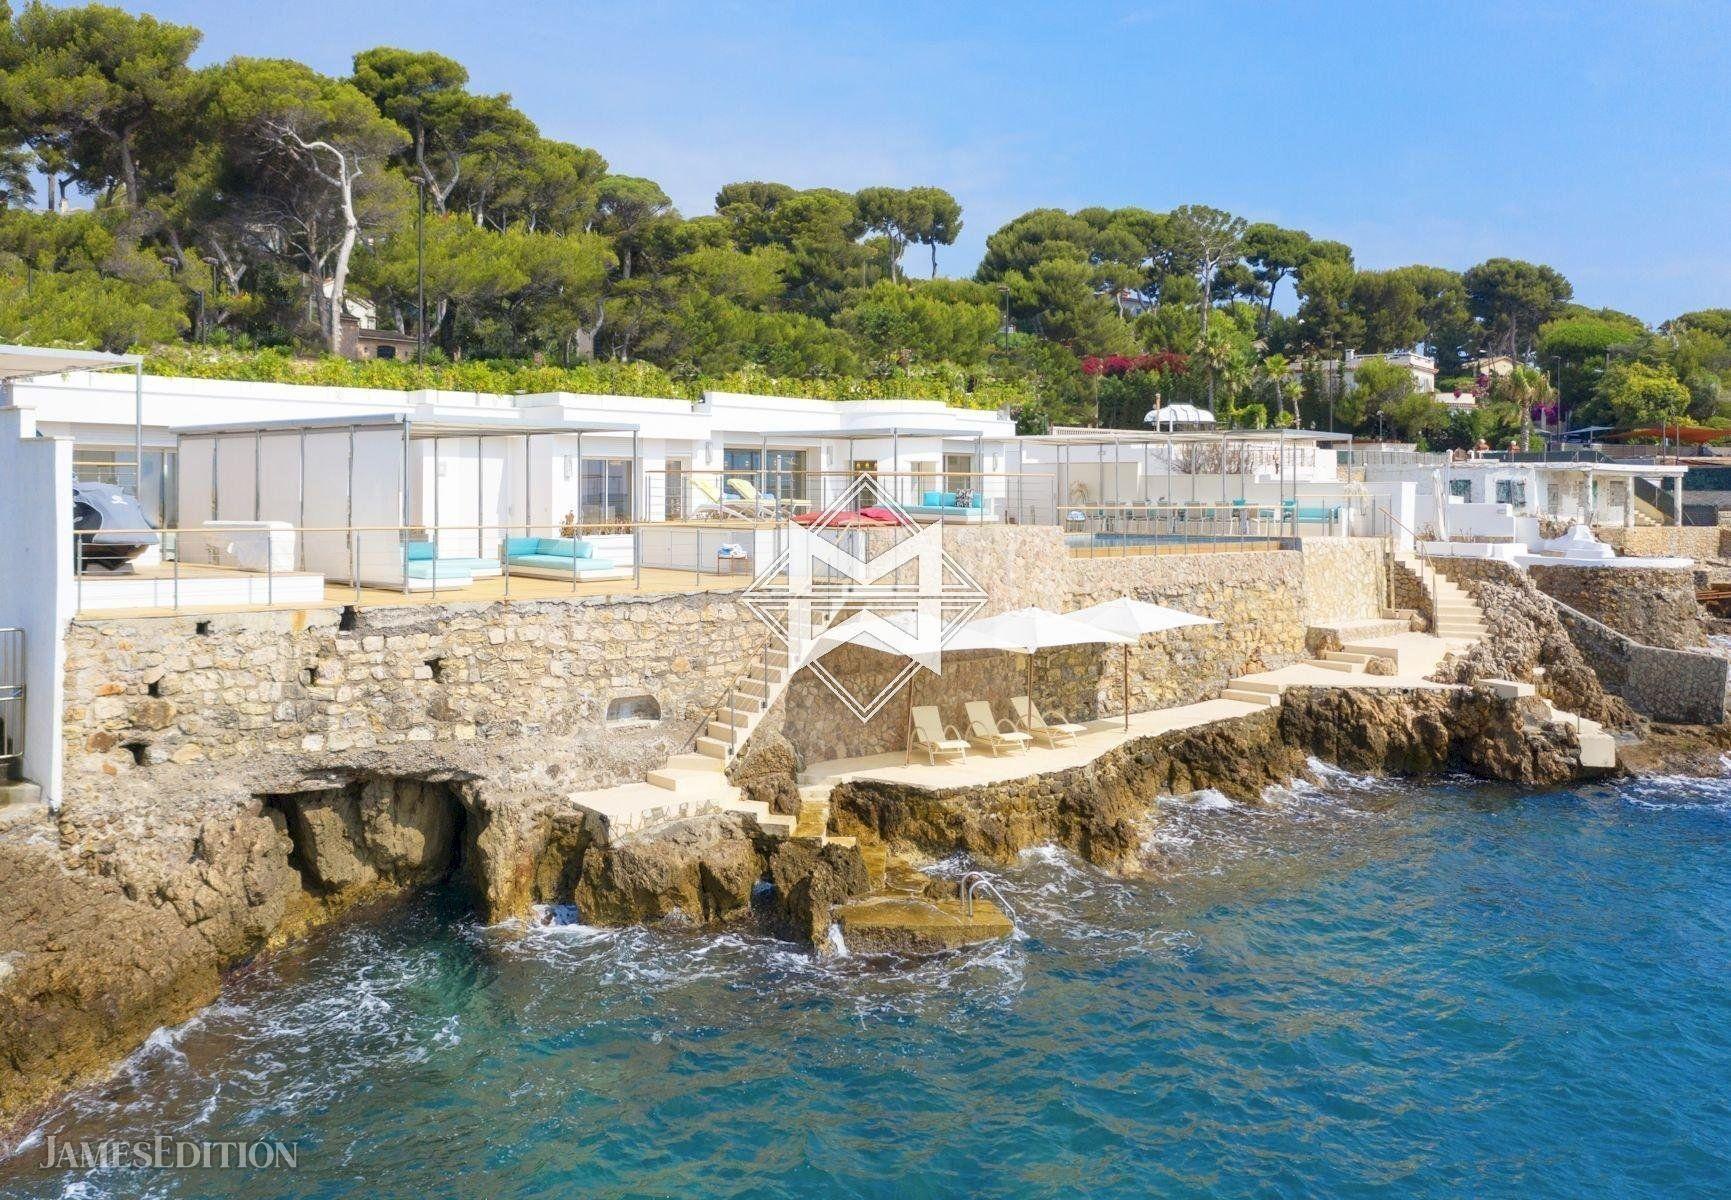 Villa in Antibes, Provence-Alpes-Côte d'Azur, France 1 - 10975344